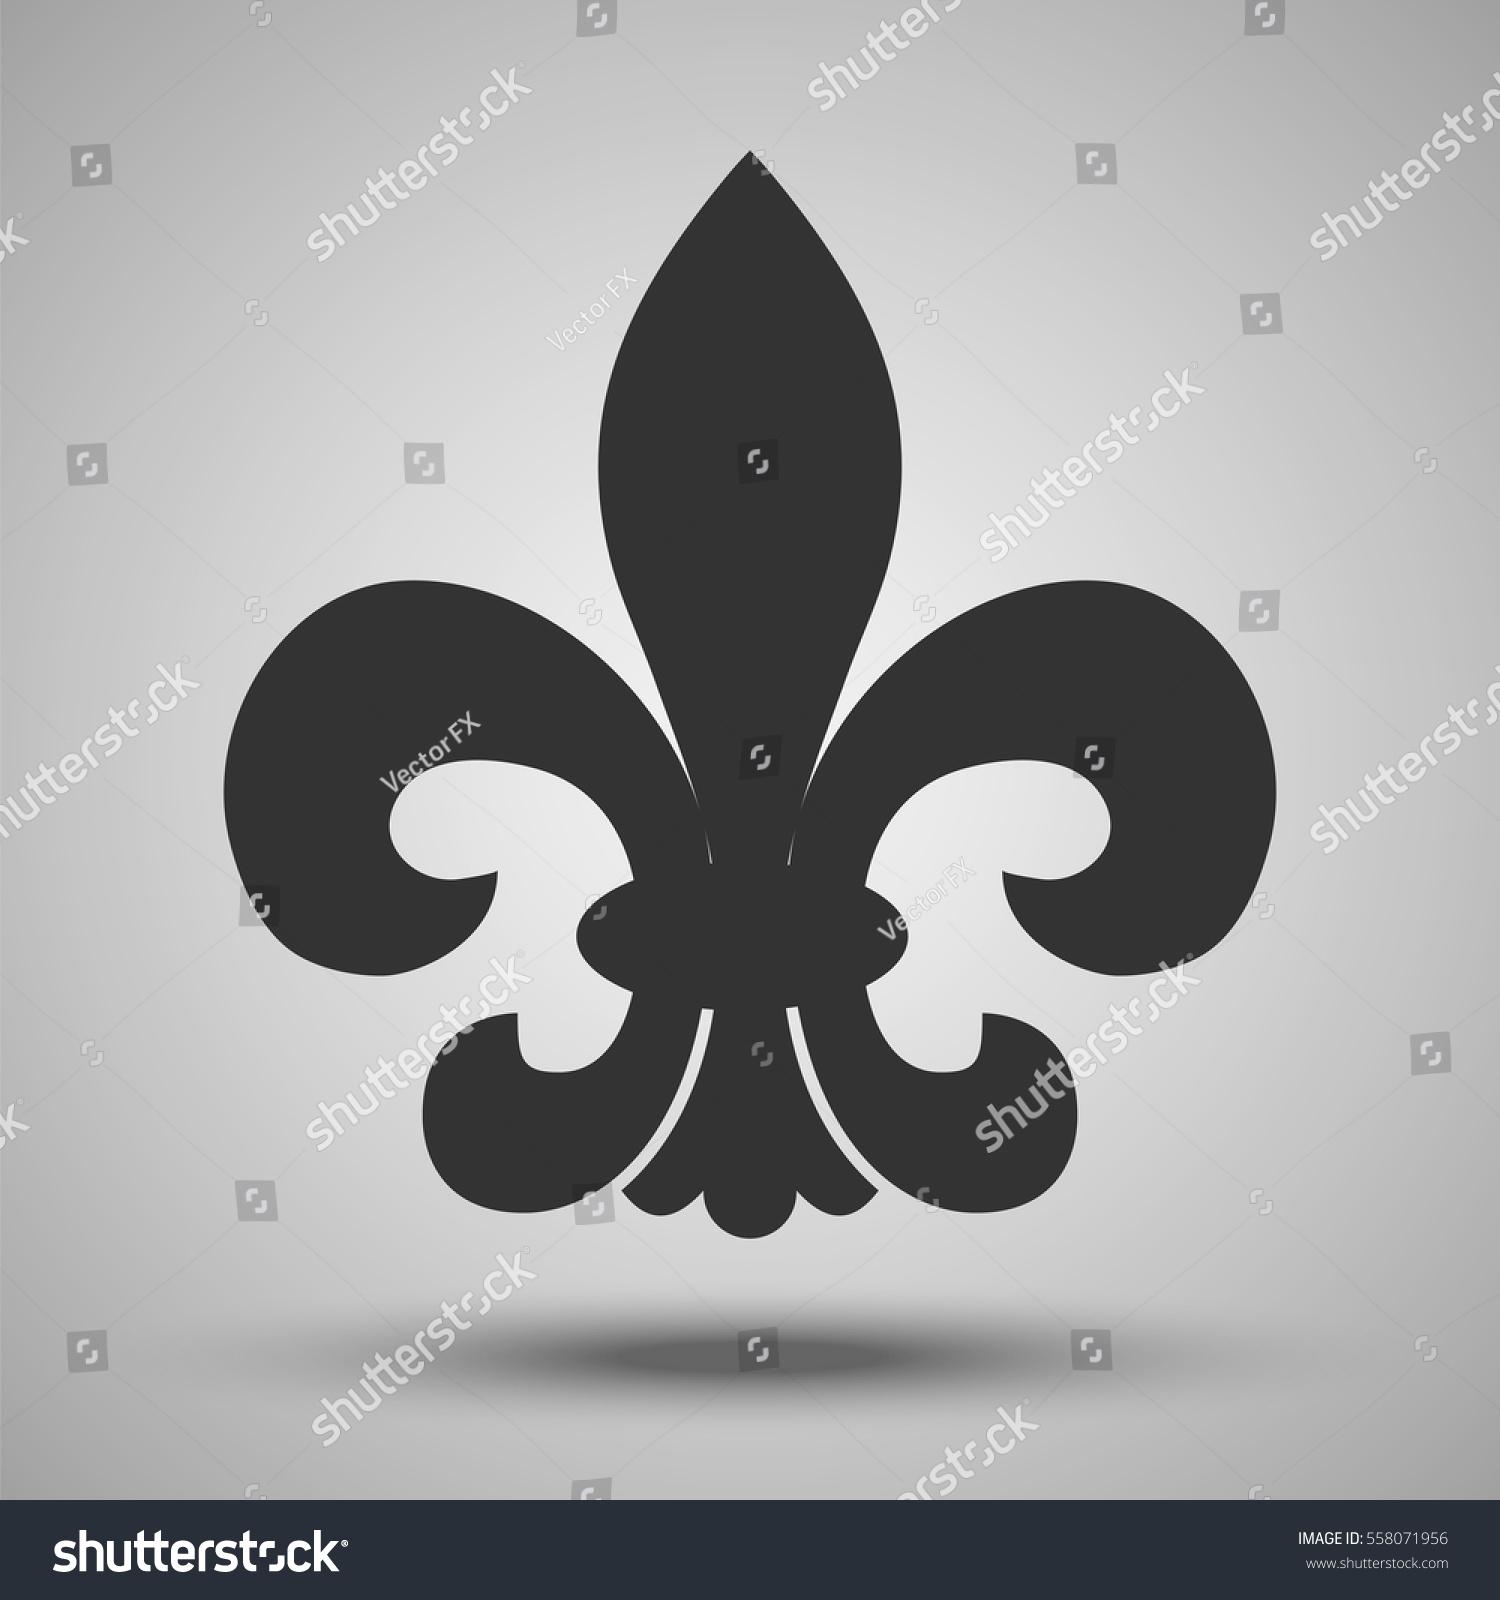 Fleur de lis french royal historical stock vector 558071956 fleur de lis french royal historical symbol vector illustration heraldic classic design element biocorpaavc